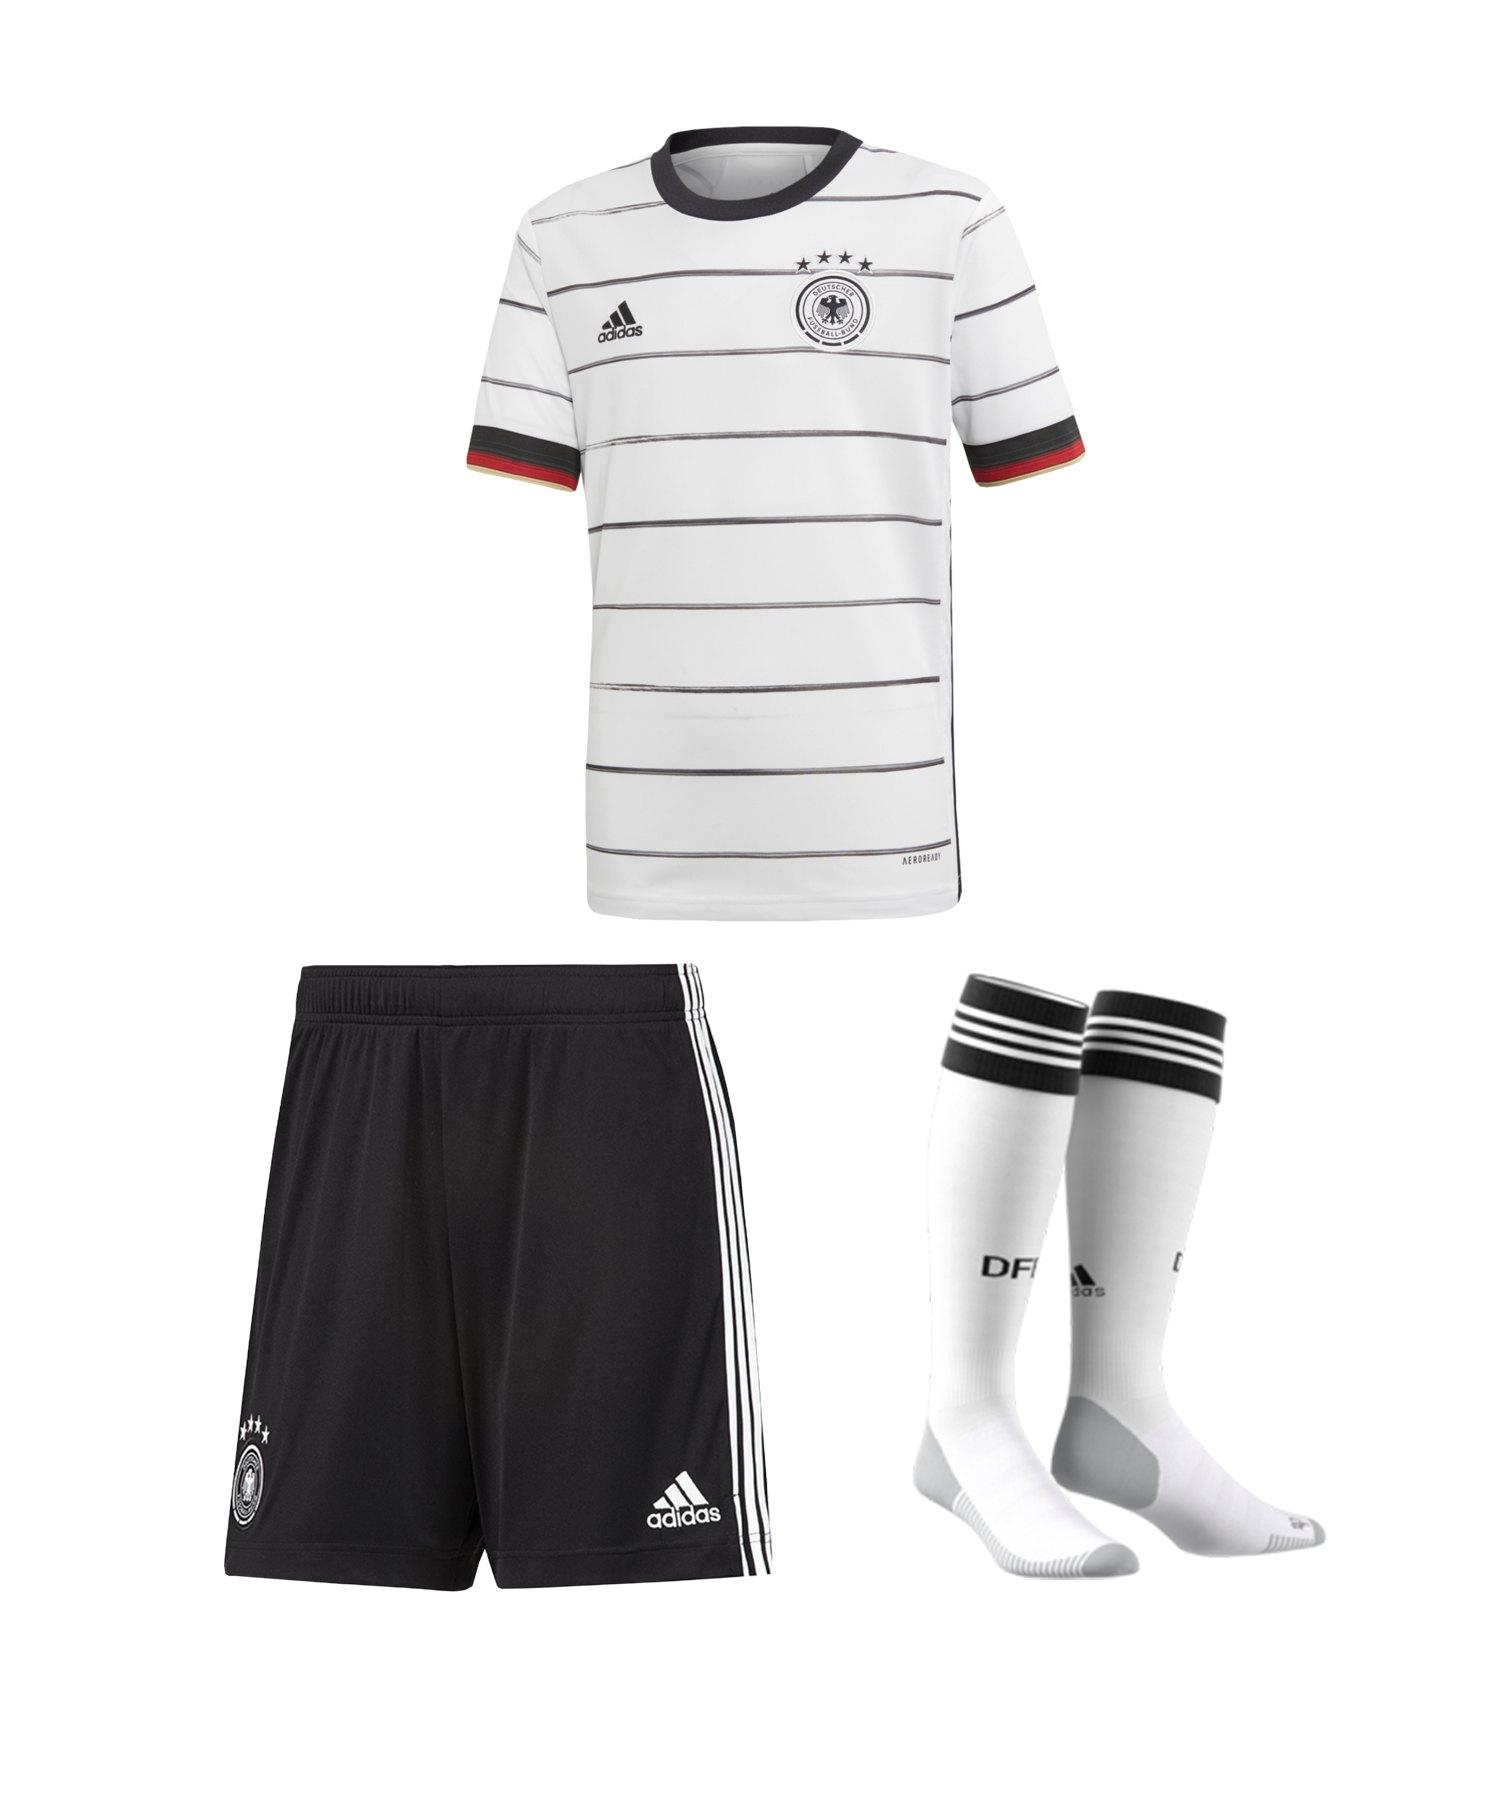 Adidas DFB EM 2020 Heim Fußballtrikot Damen white im Online